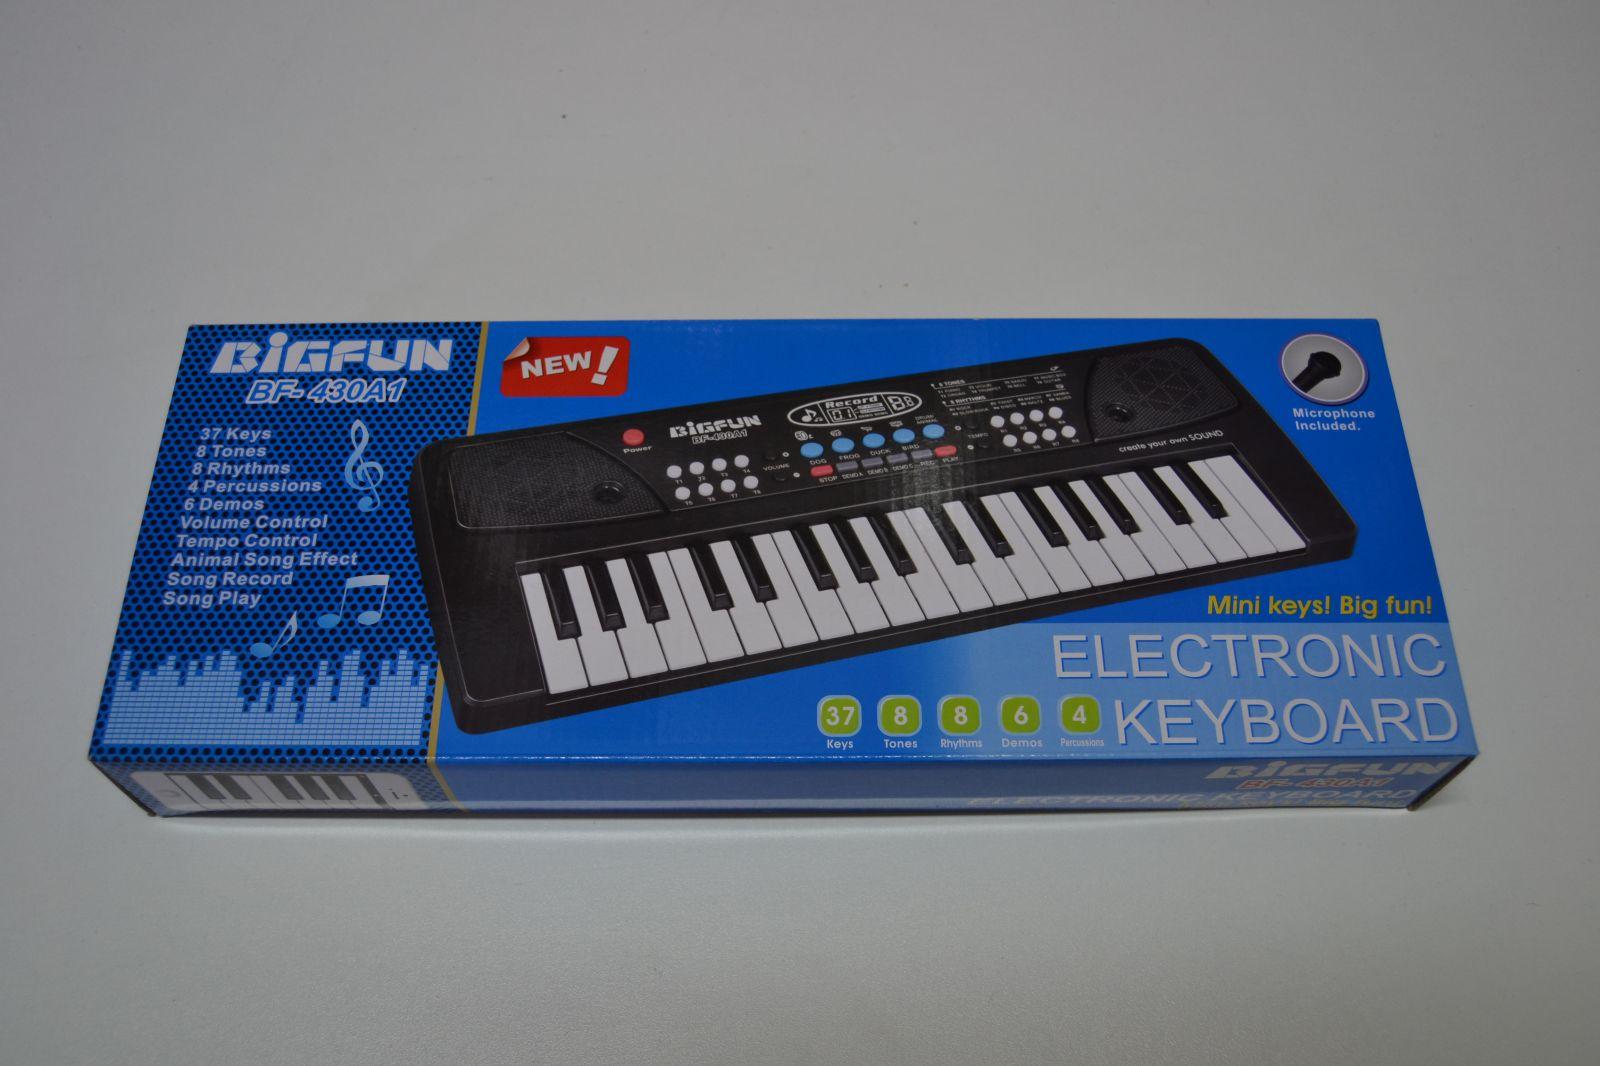 Elektronické klávesy BIGFUN BF - 430A1, piano, pianko